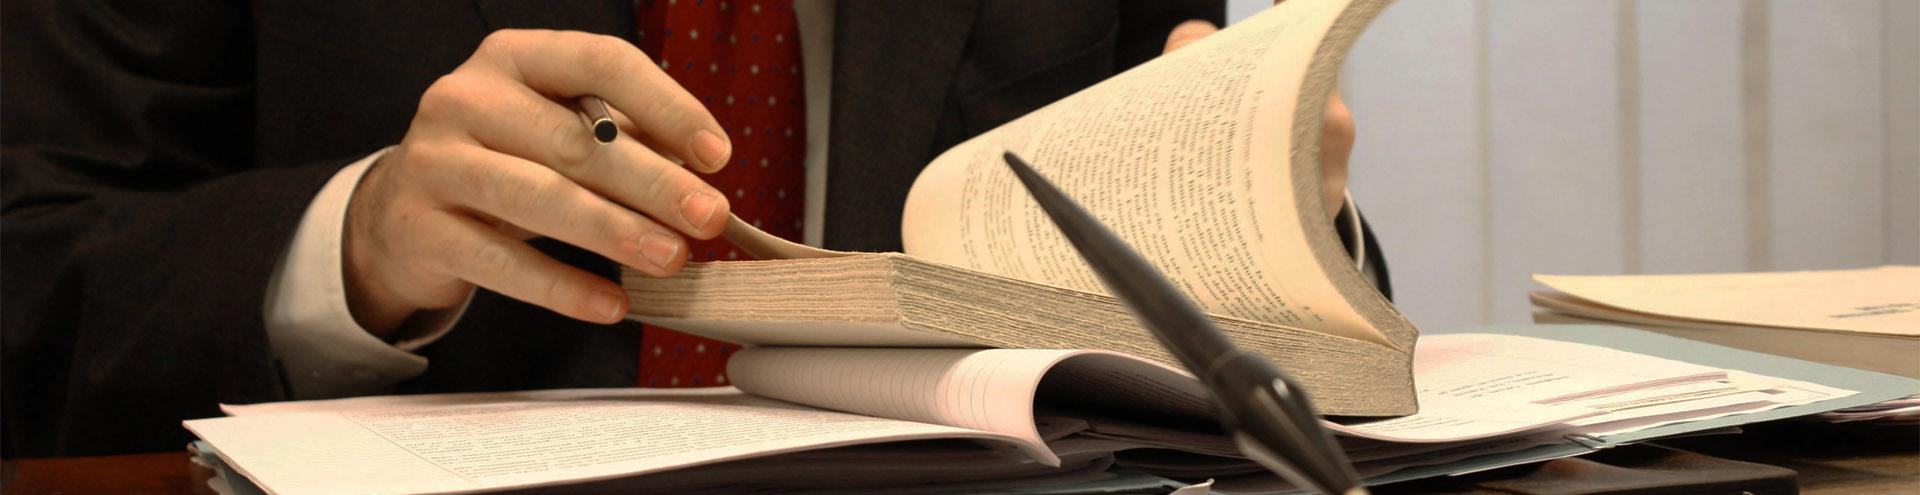 юридические услуги в Йошкар-Оле